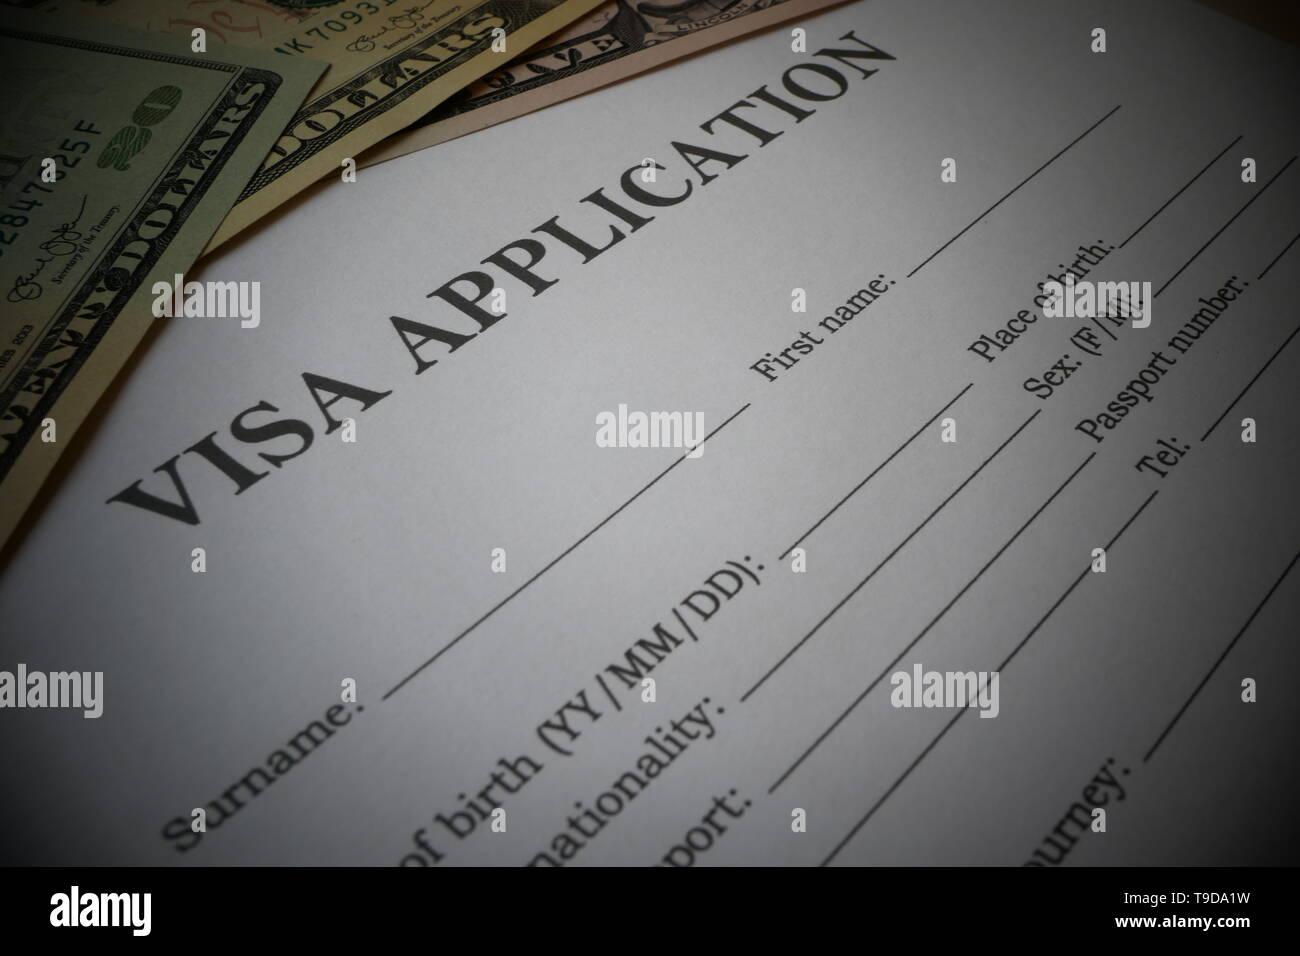 application form for canadian citizenship passport